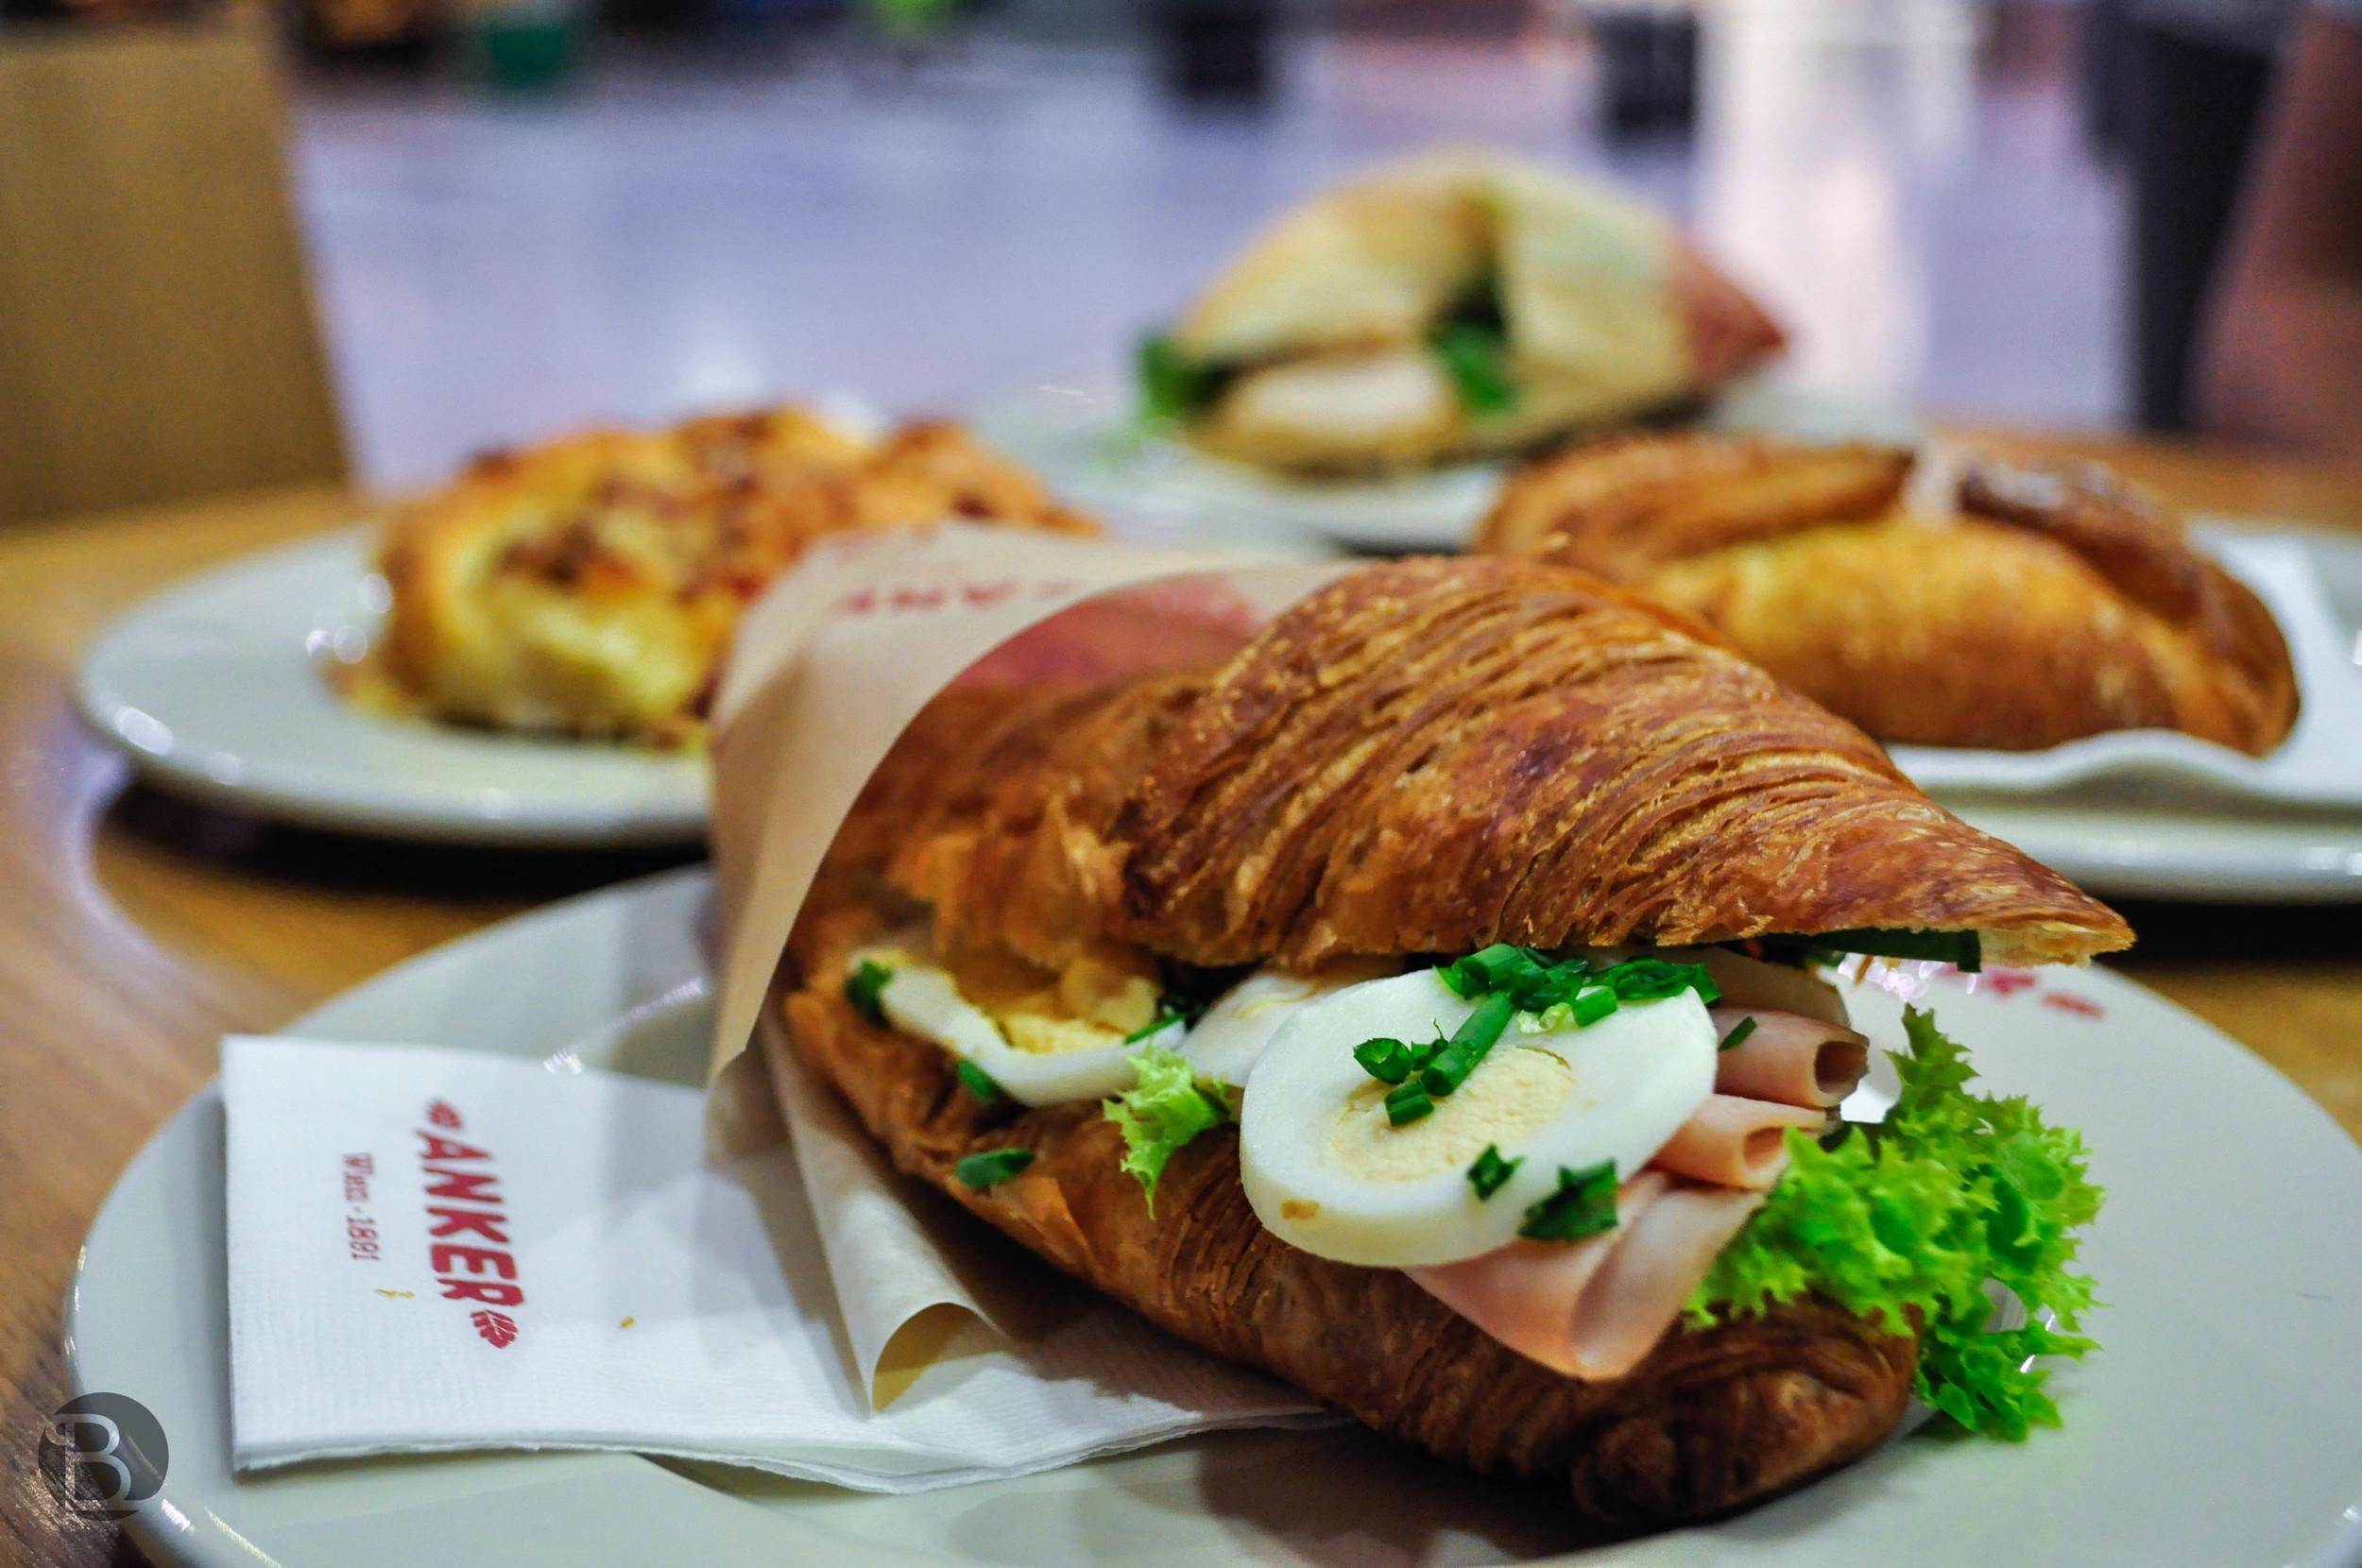 anker croissant